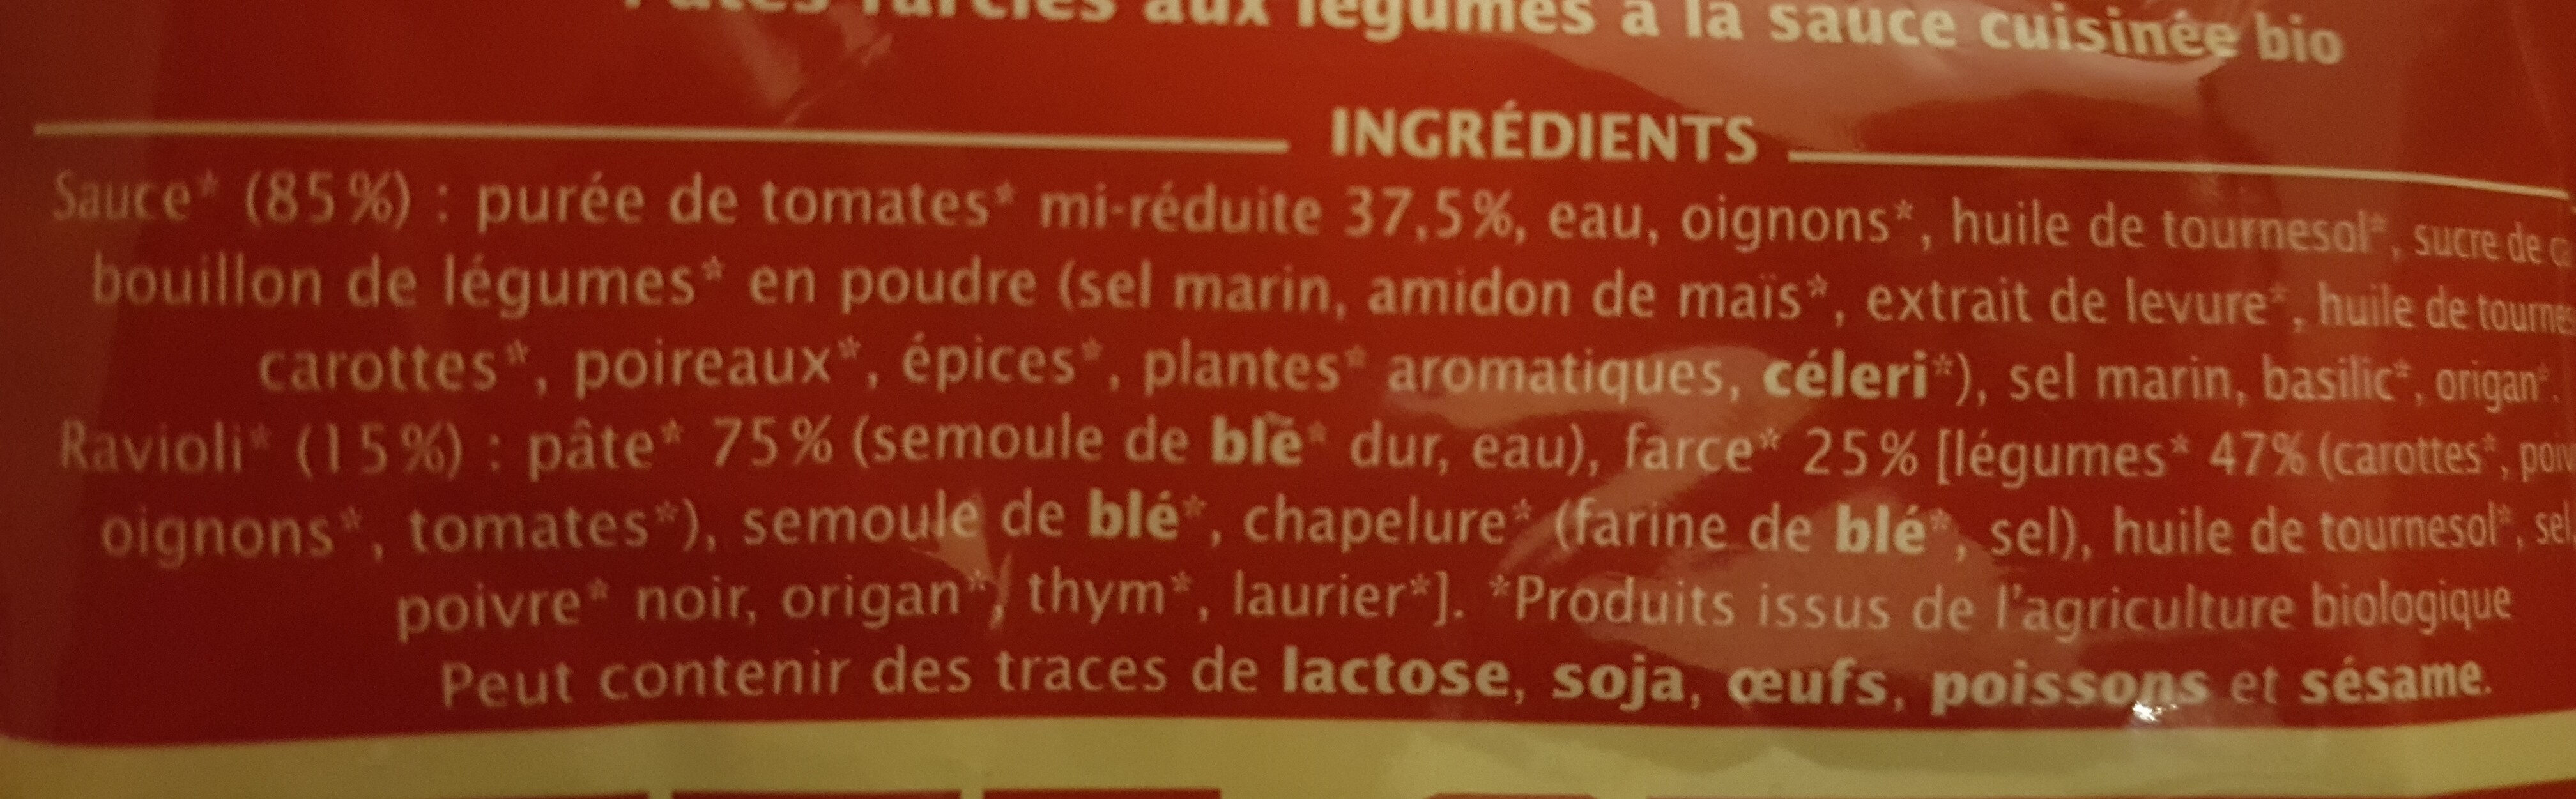 Ravioli de légumes - Ingrédients - fr